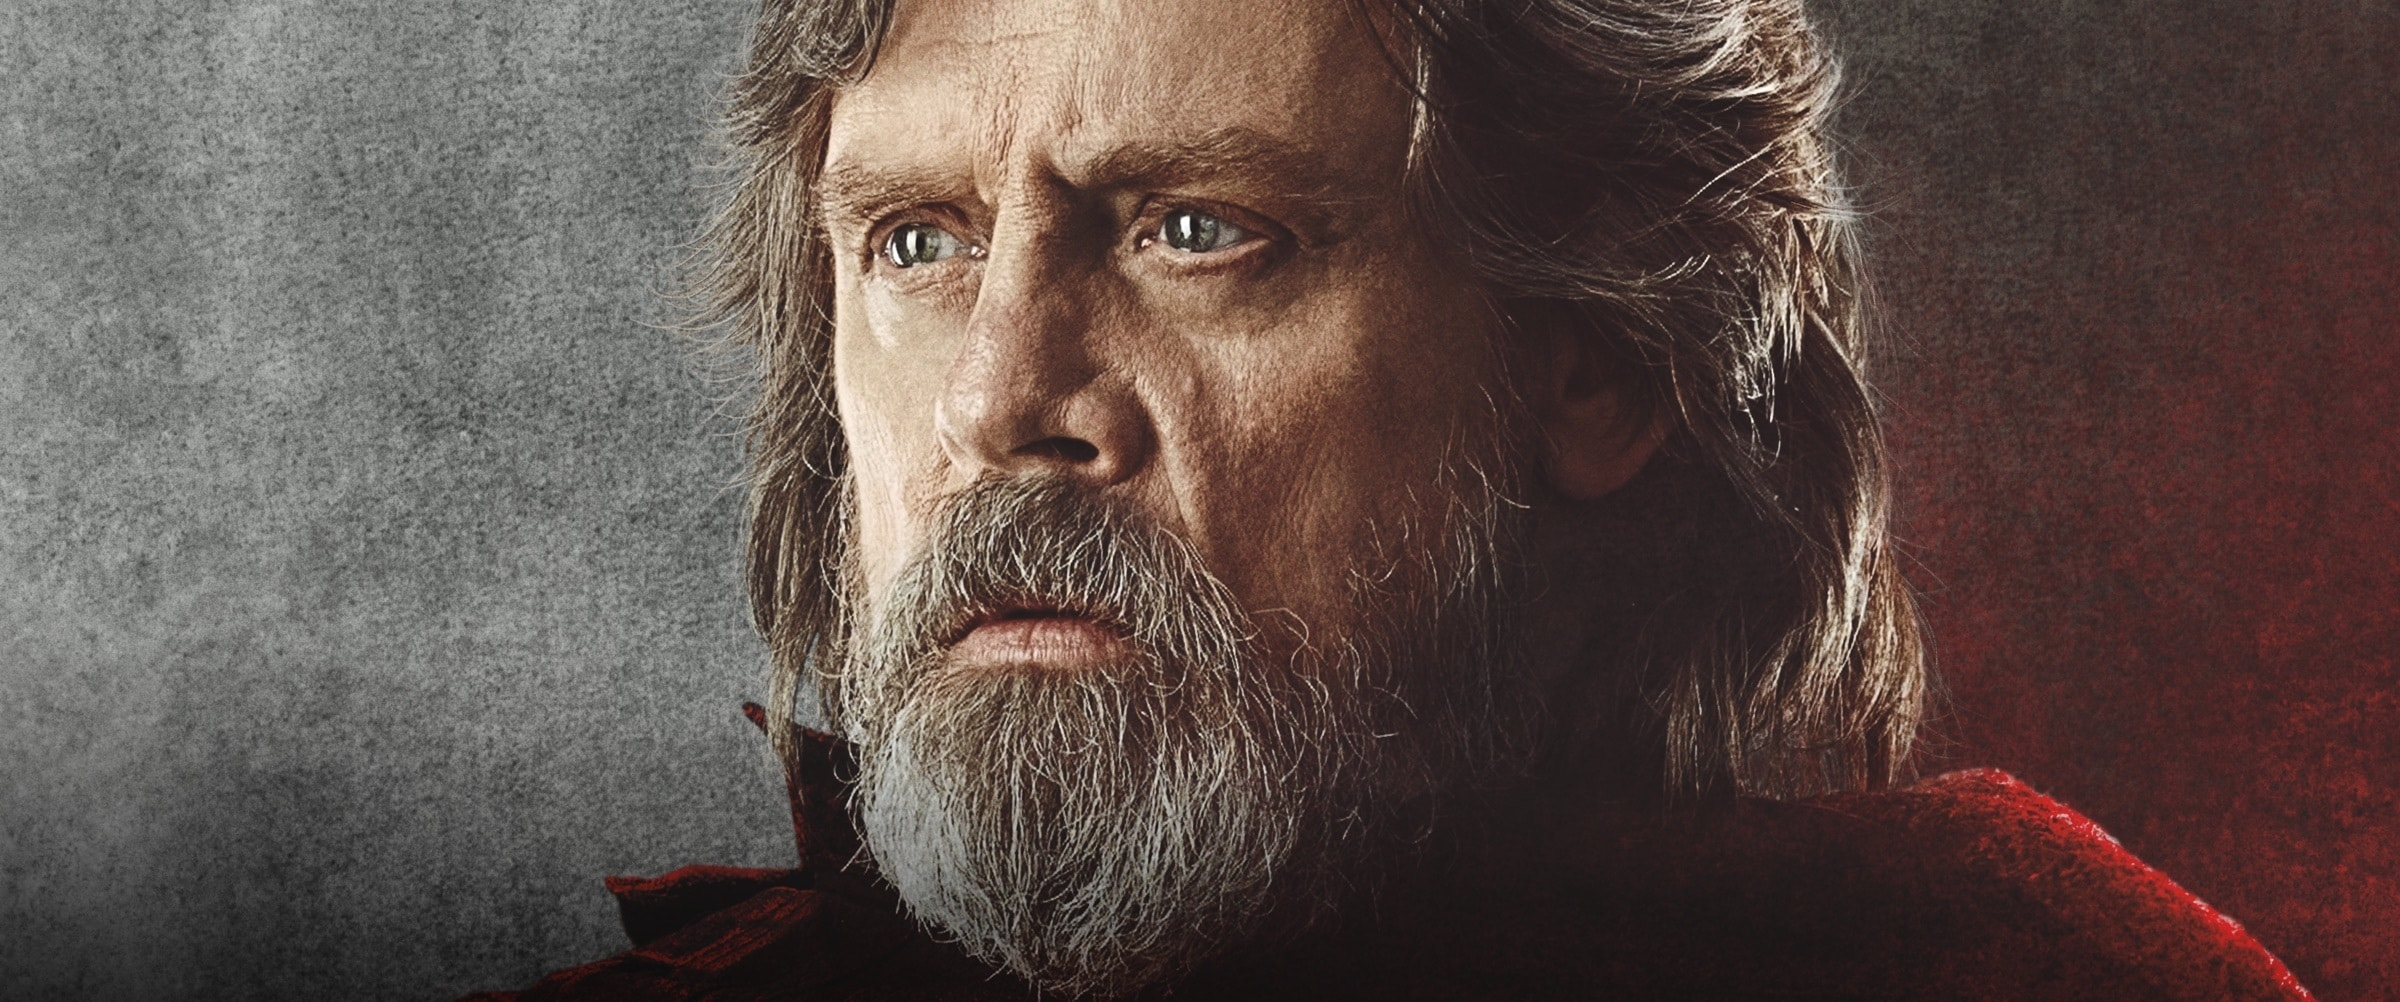 Star Wars : The Last Jedi Luke Dark Moviepage | In Cinemas